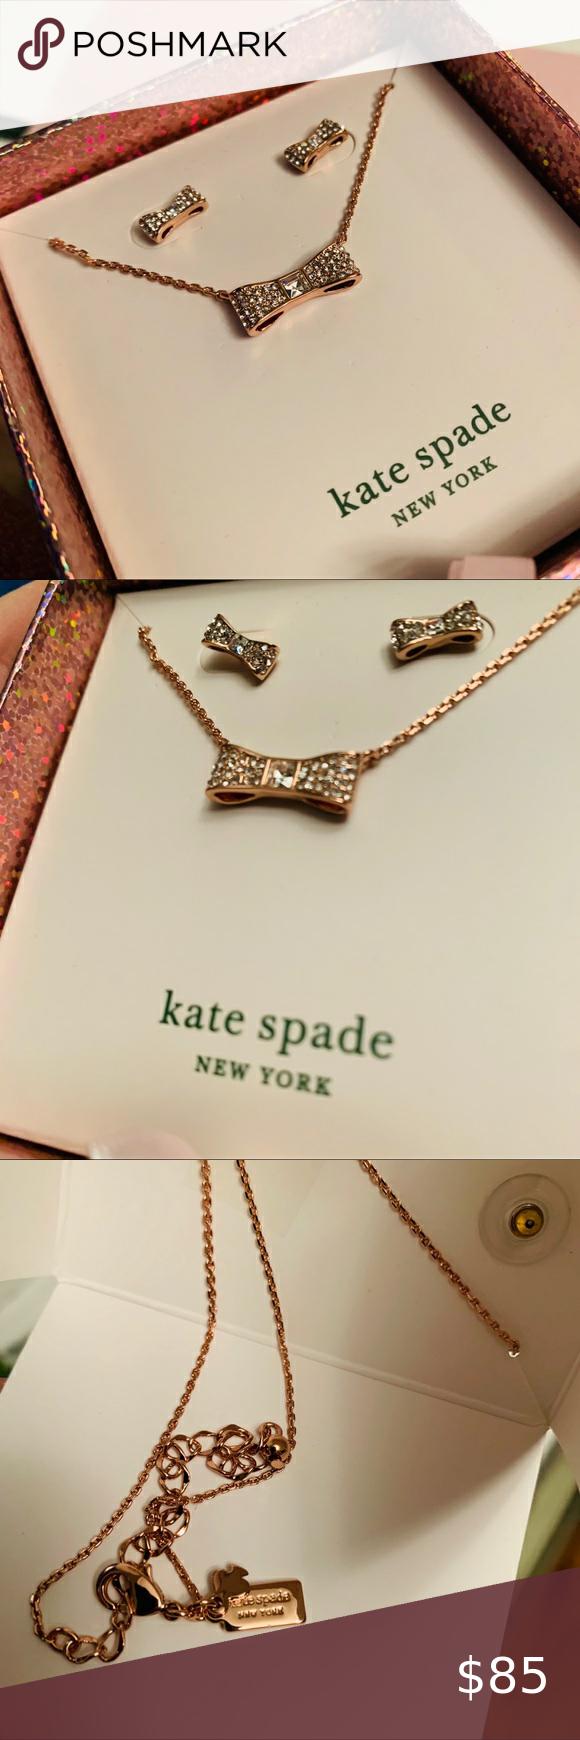 34+ Kate spade jewelry gift set info